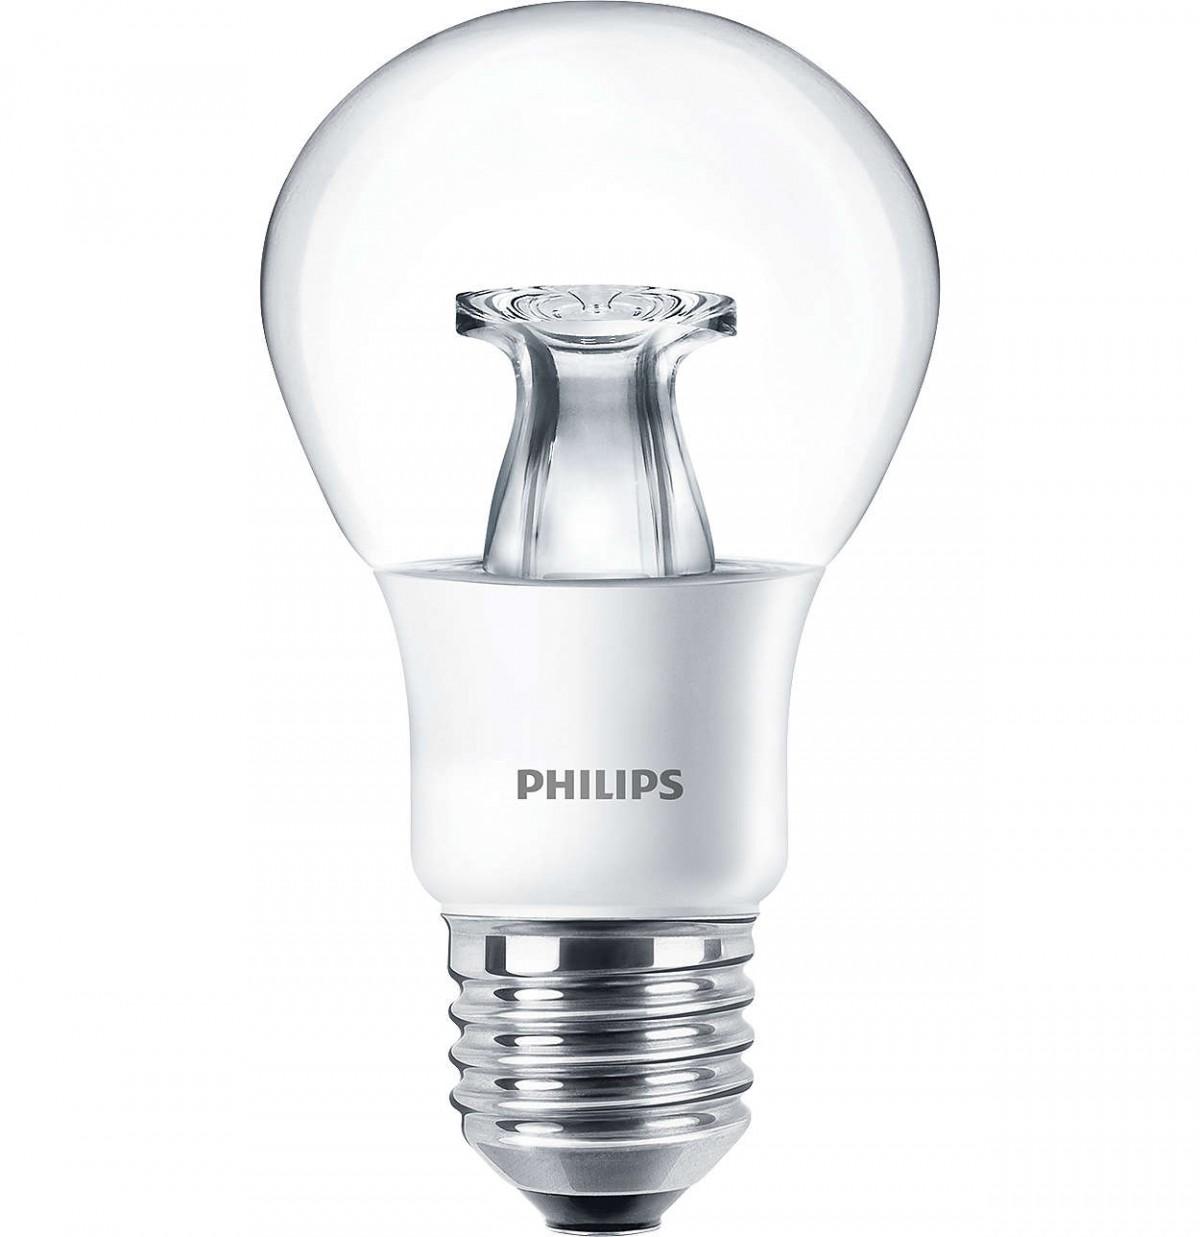 LED žárovka úsporná Philips 6W -> ekvivalent 40W E27 - MASTER LEDbulb DT 6-40W E27 A60 CL